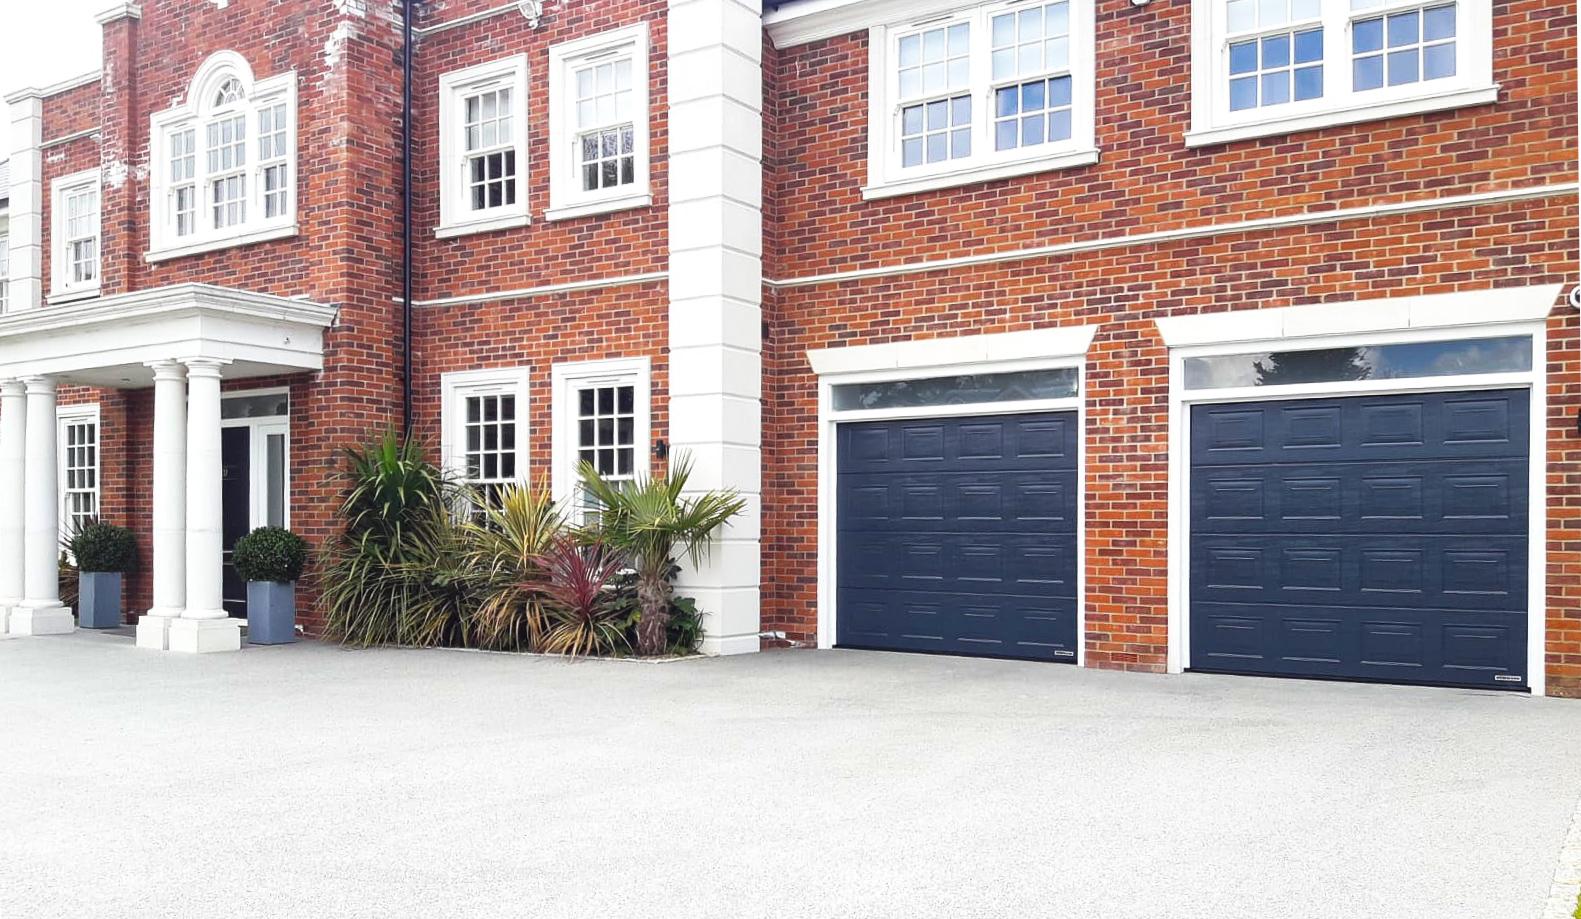 Hormann LPU42 S-Panelled Sectional Garage Doors in Anthracite Grey Woodgrain